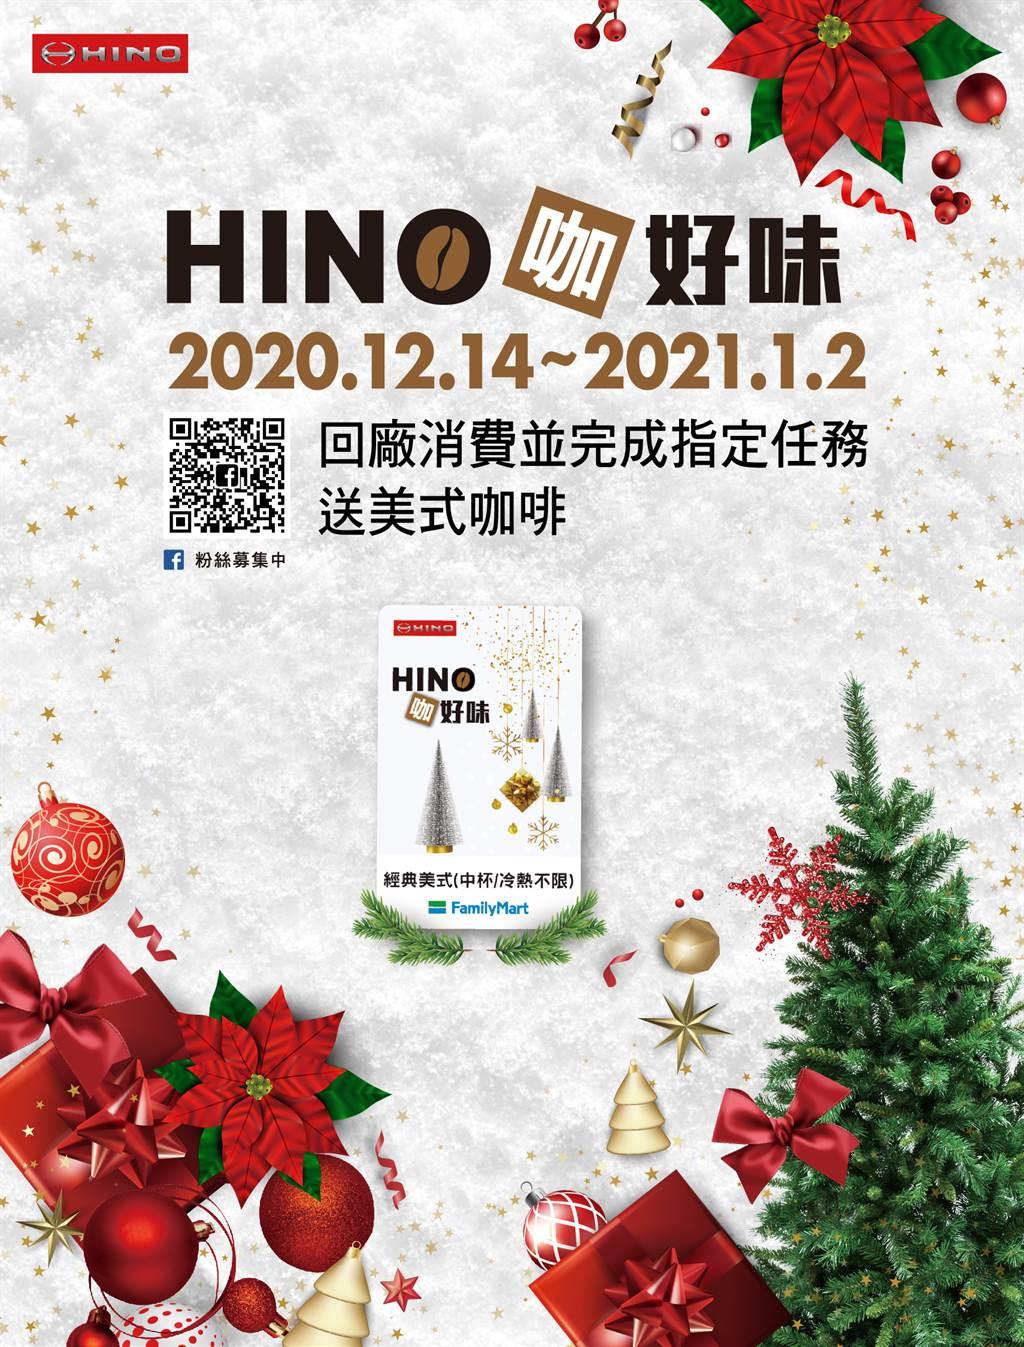 HINO總代理和泰汽車於2020/12/14~2021/1/2舉辦 「HINO咖好味」快閃活動。